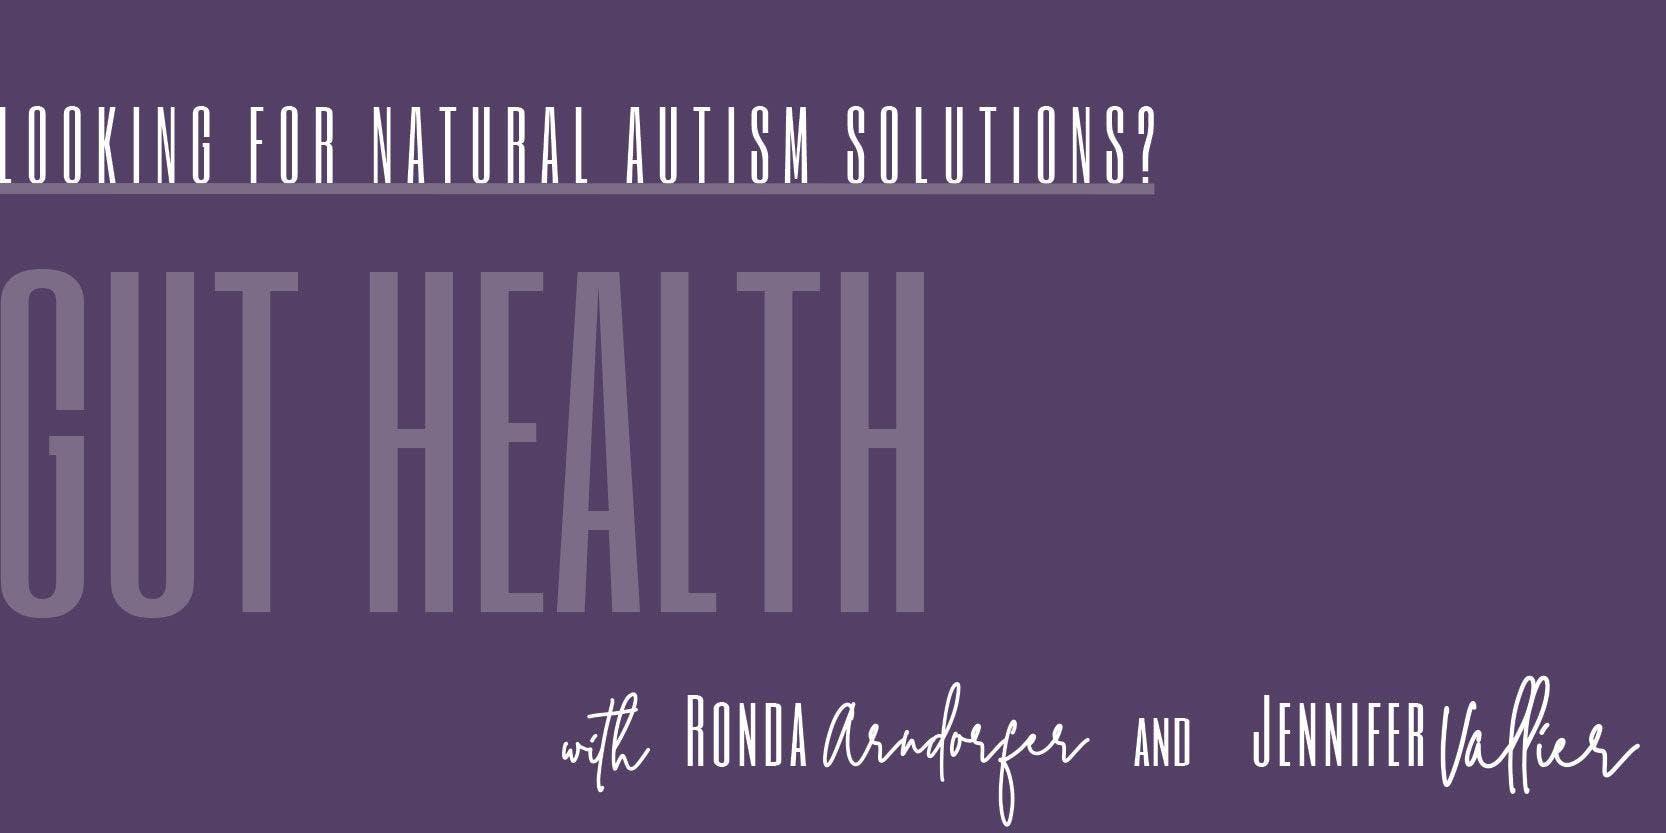 Natural Solutions for Autism Toolkit - Phoenix, Arizona